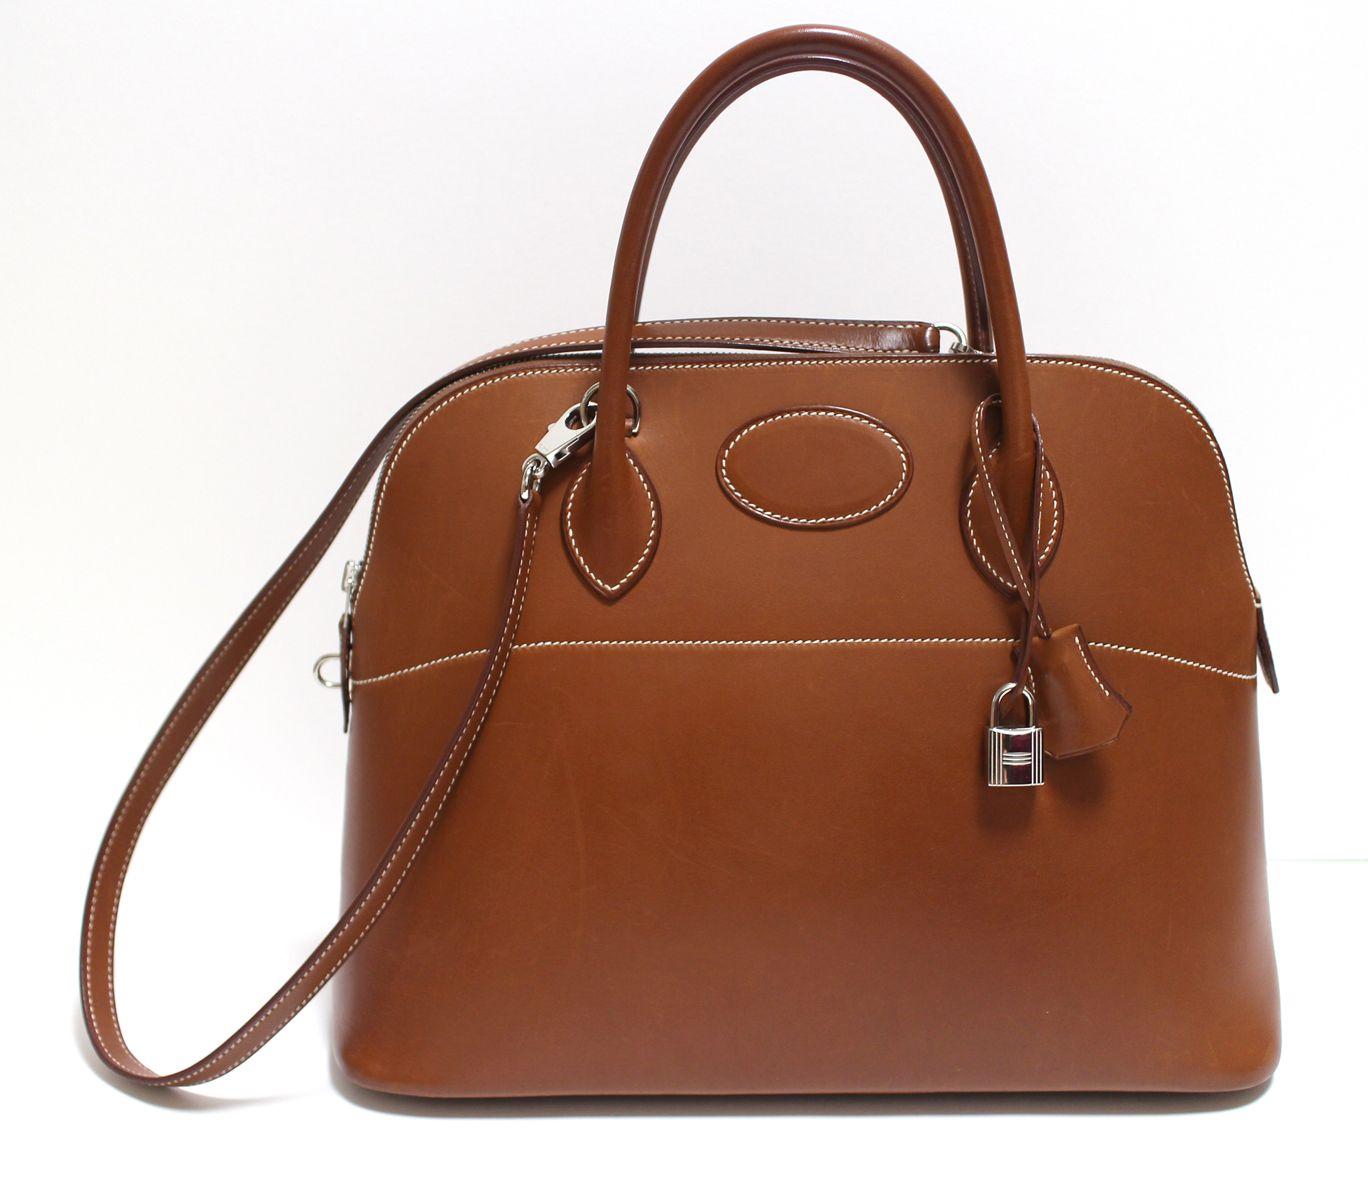 b8488606d2ec Hermes Bolide 37cm Fauve Barenia Palladium HW handbags leather